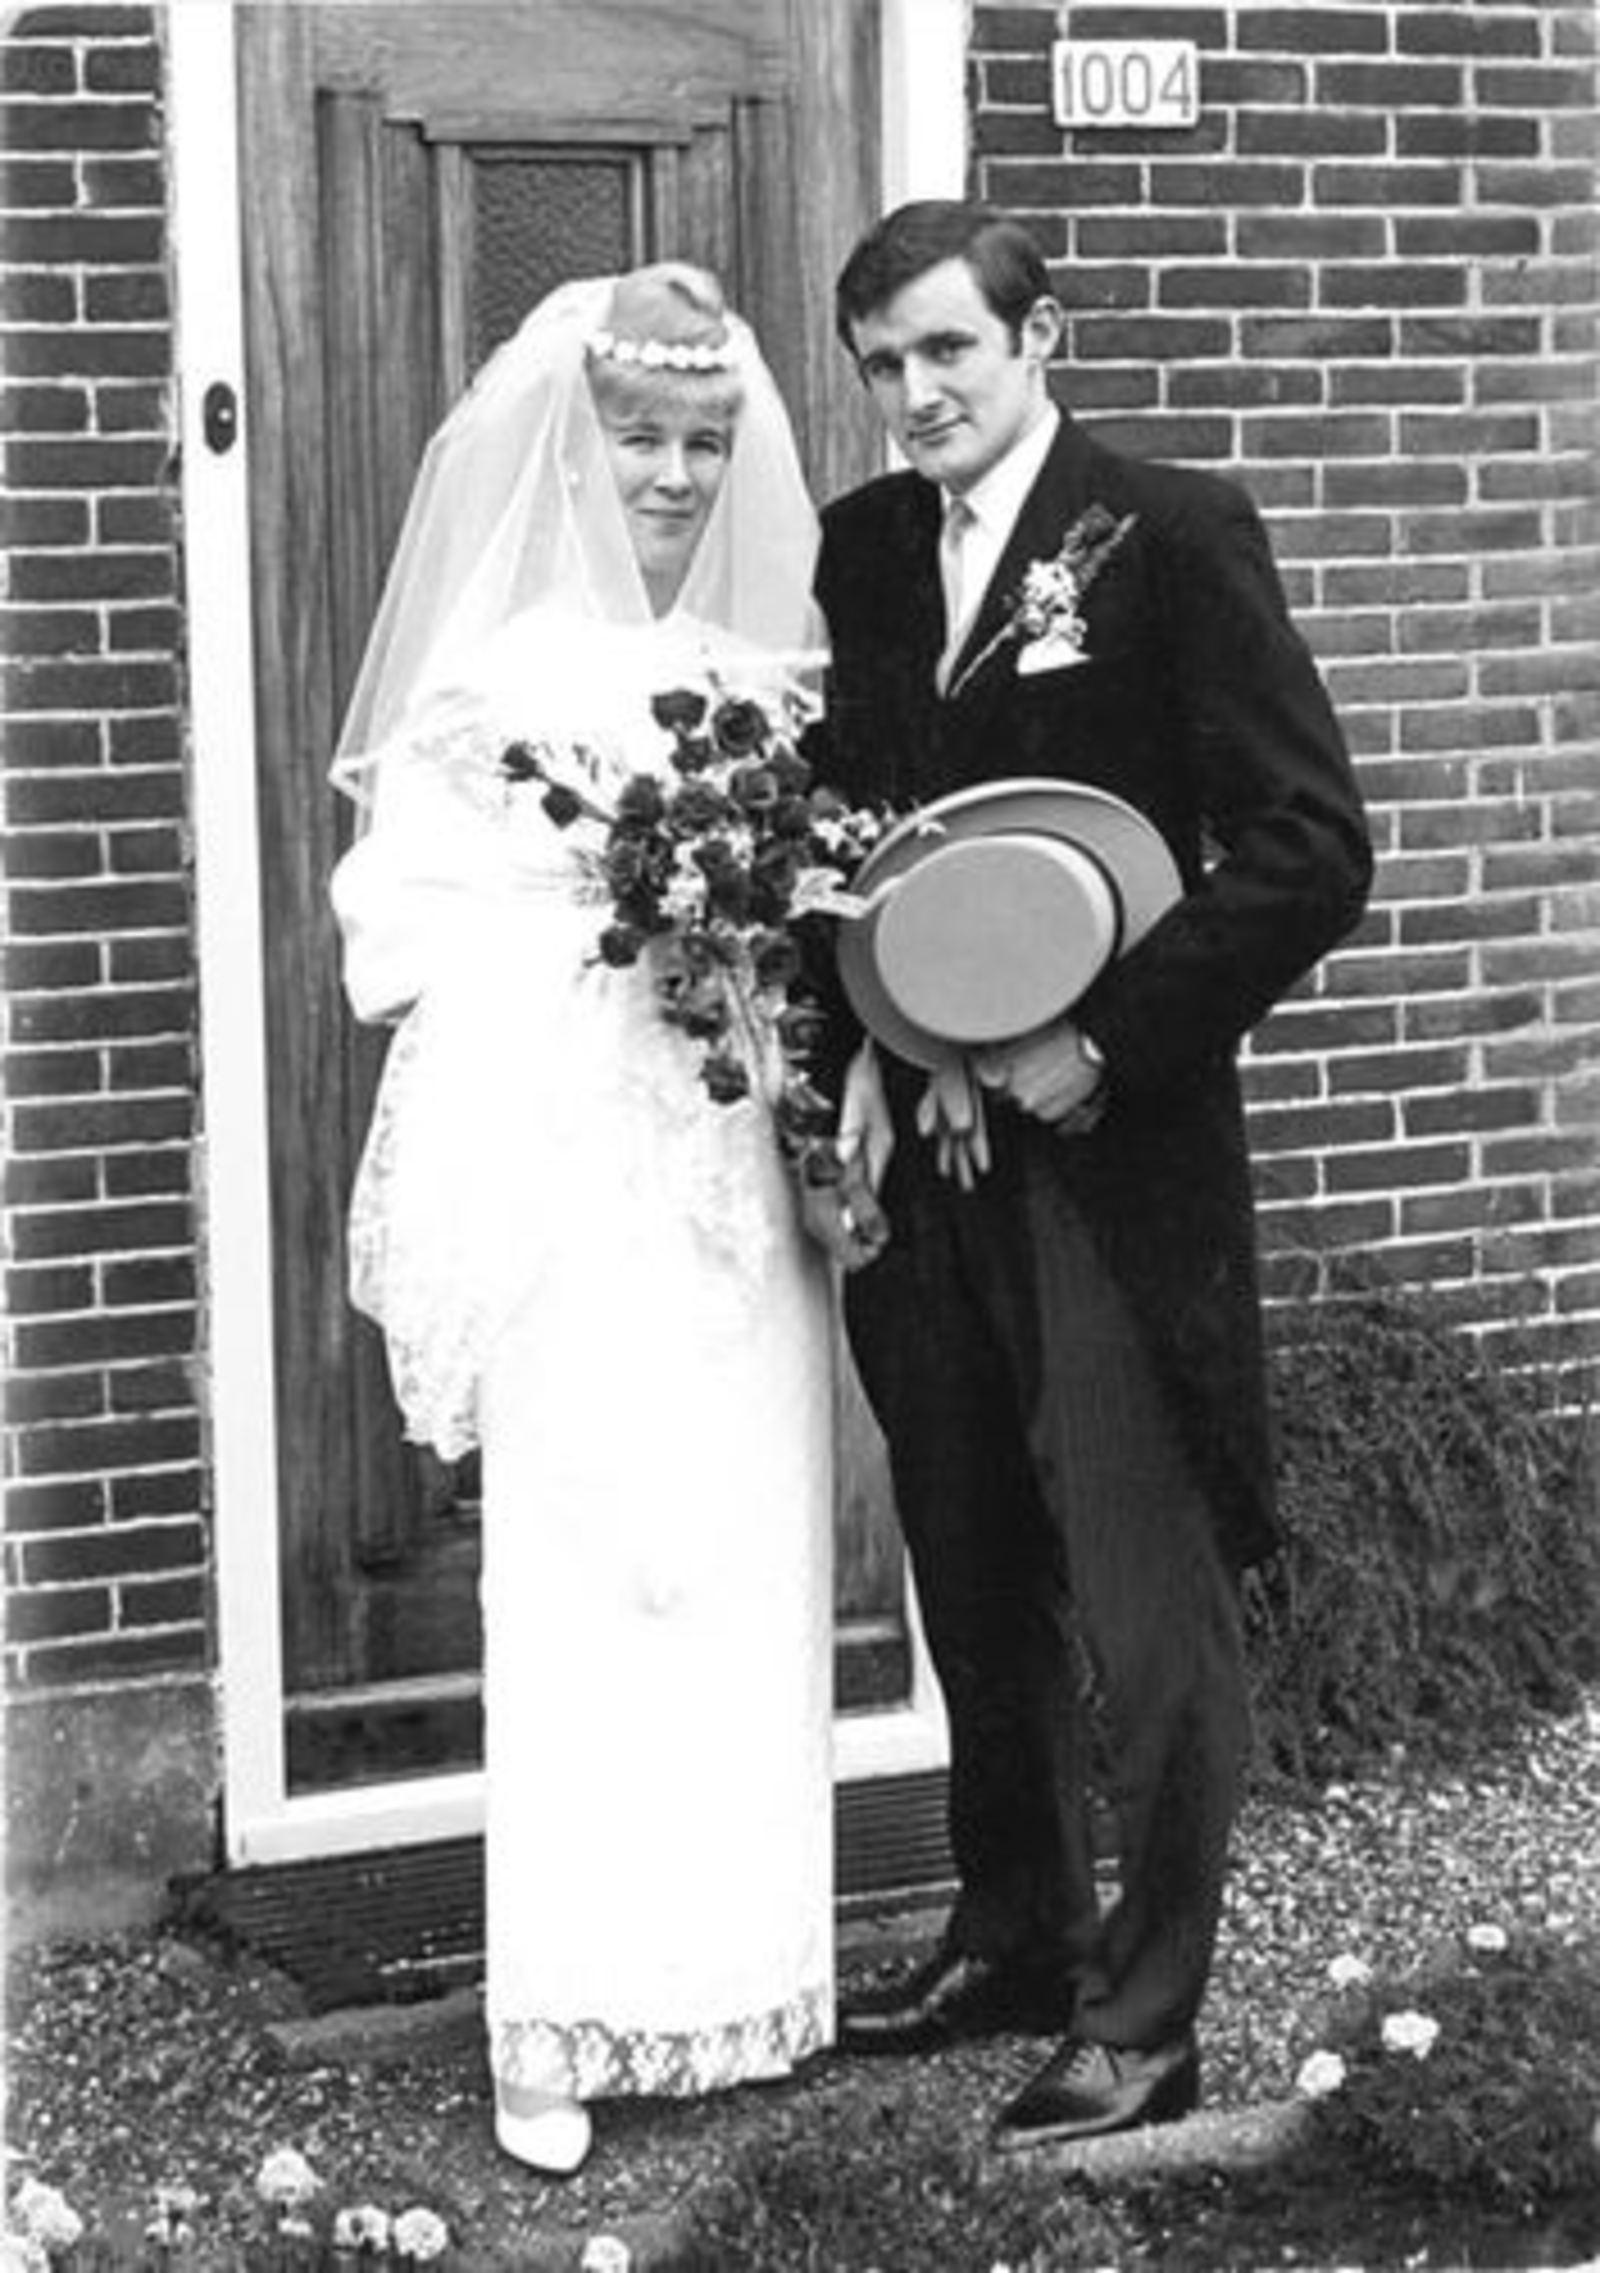 Imanse Rina 1950 1967 trouwt Piet Geluk 21